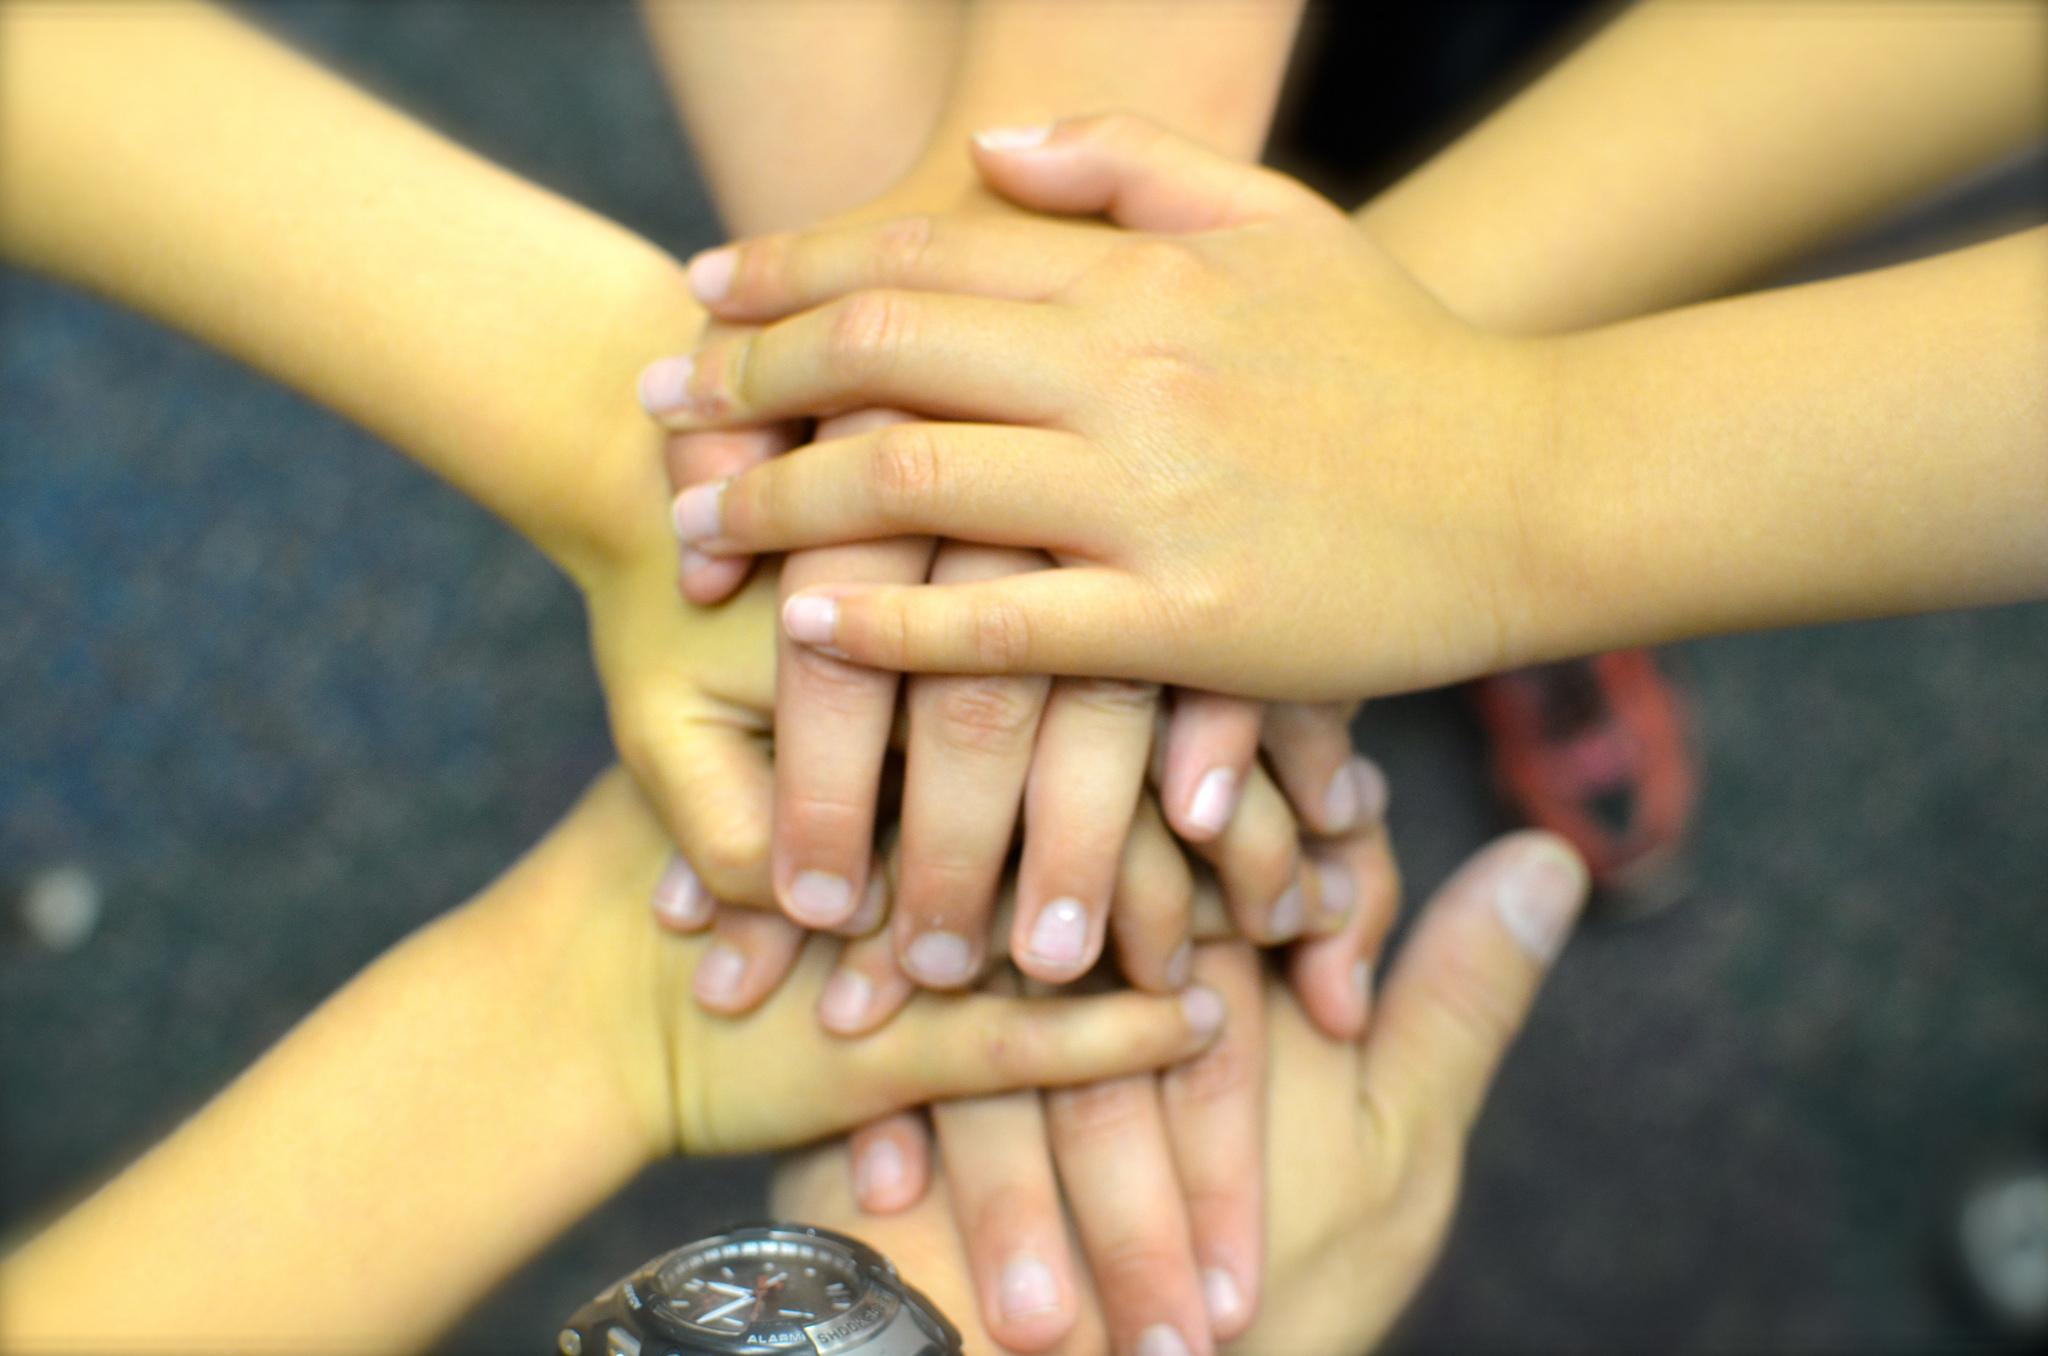 """teamwork 5"" by D I. Creative Commons licence CC BY-NC-SA"